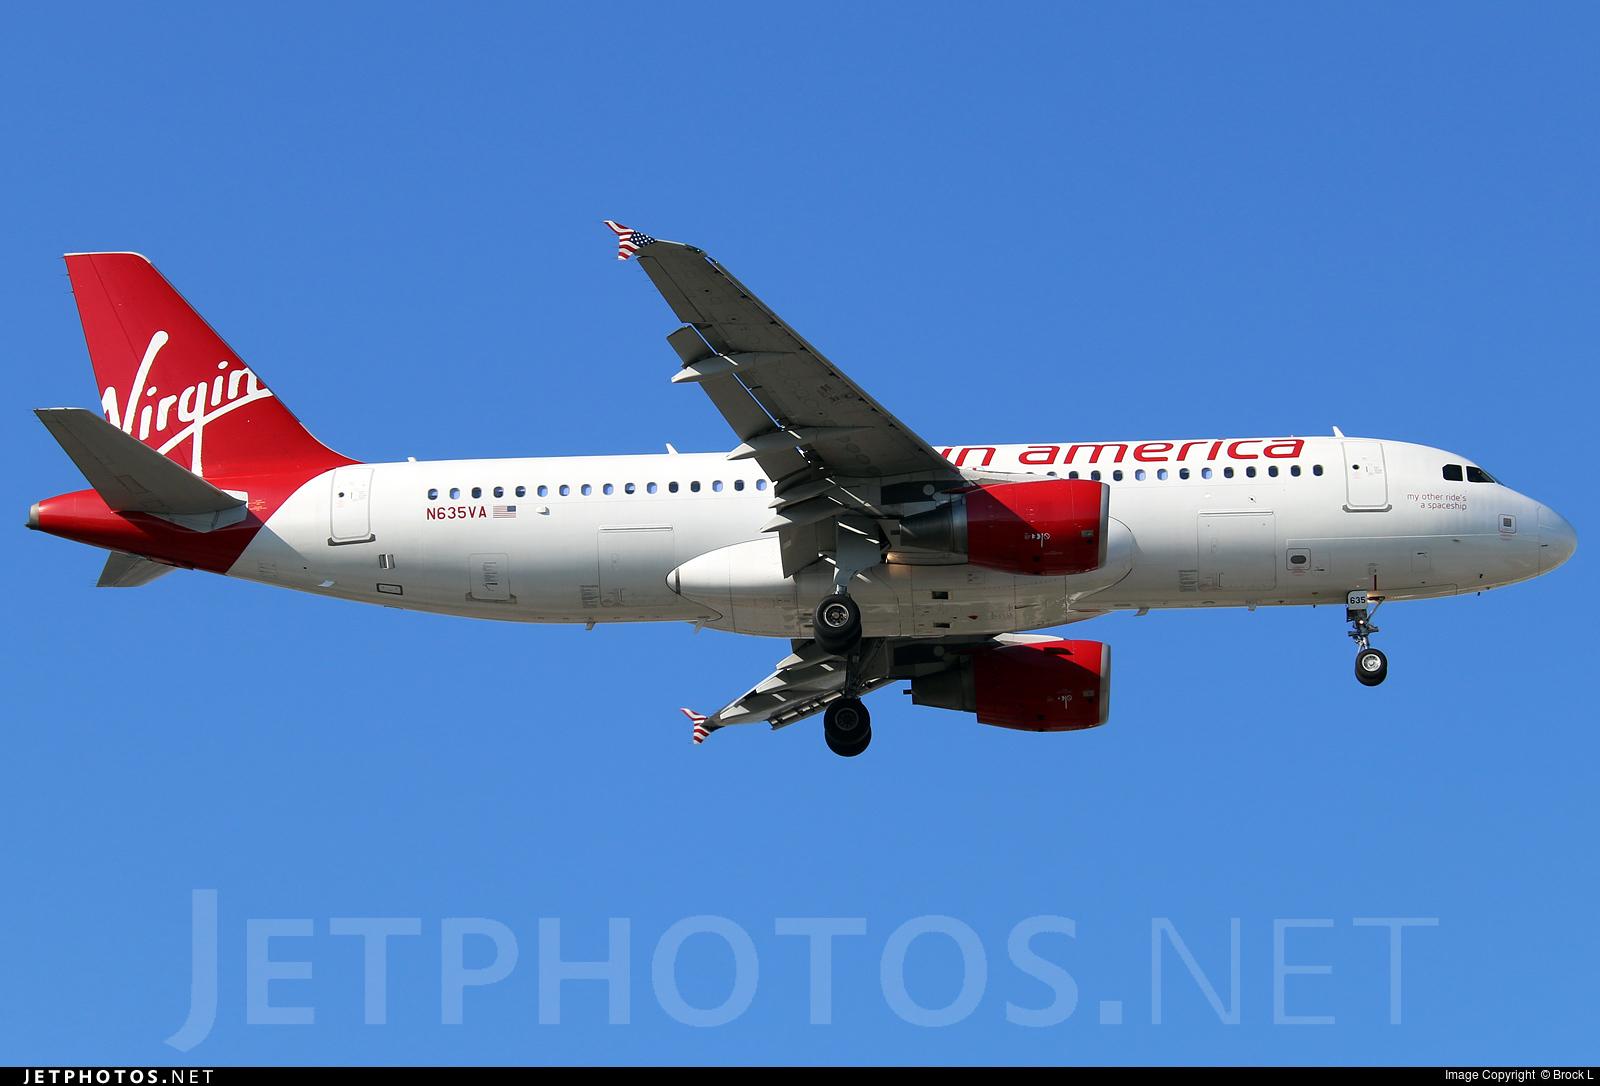 Photo of N635VA Airbus A320-214 by Brock L